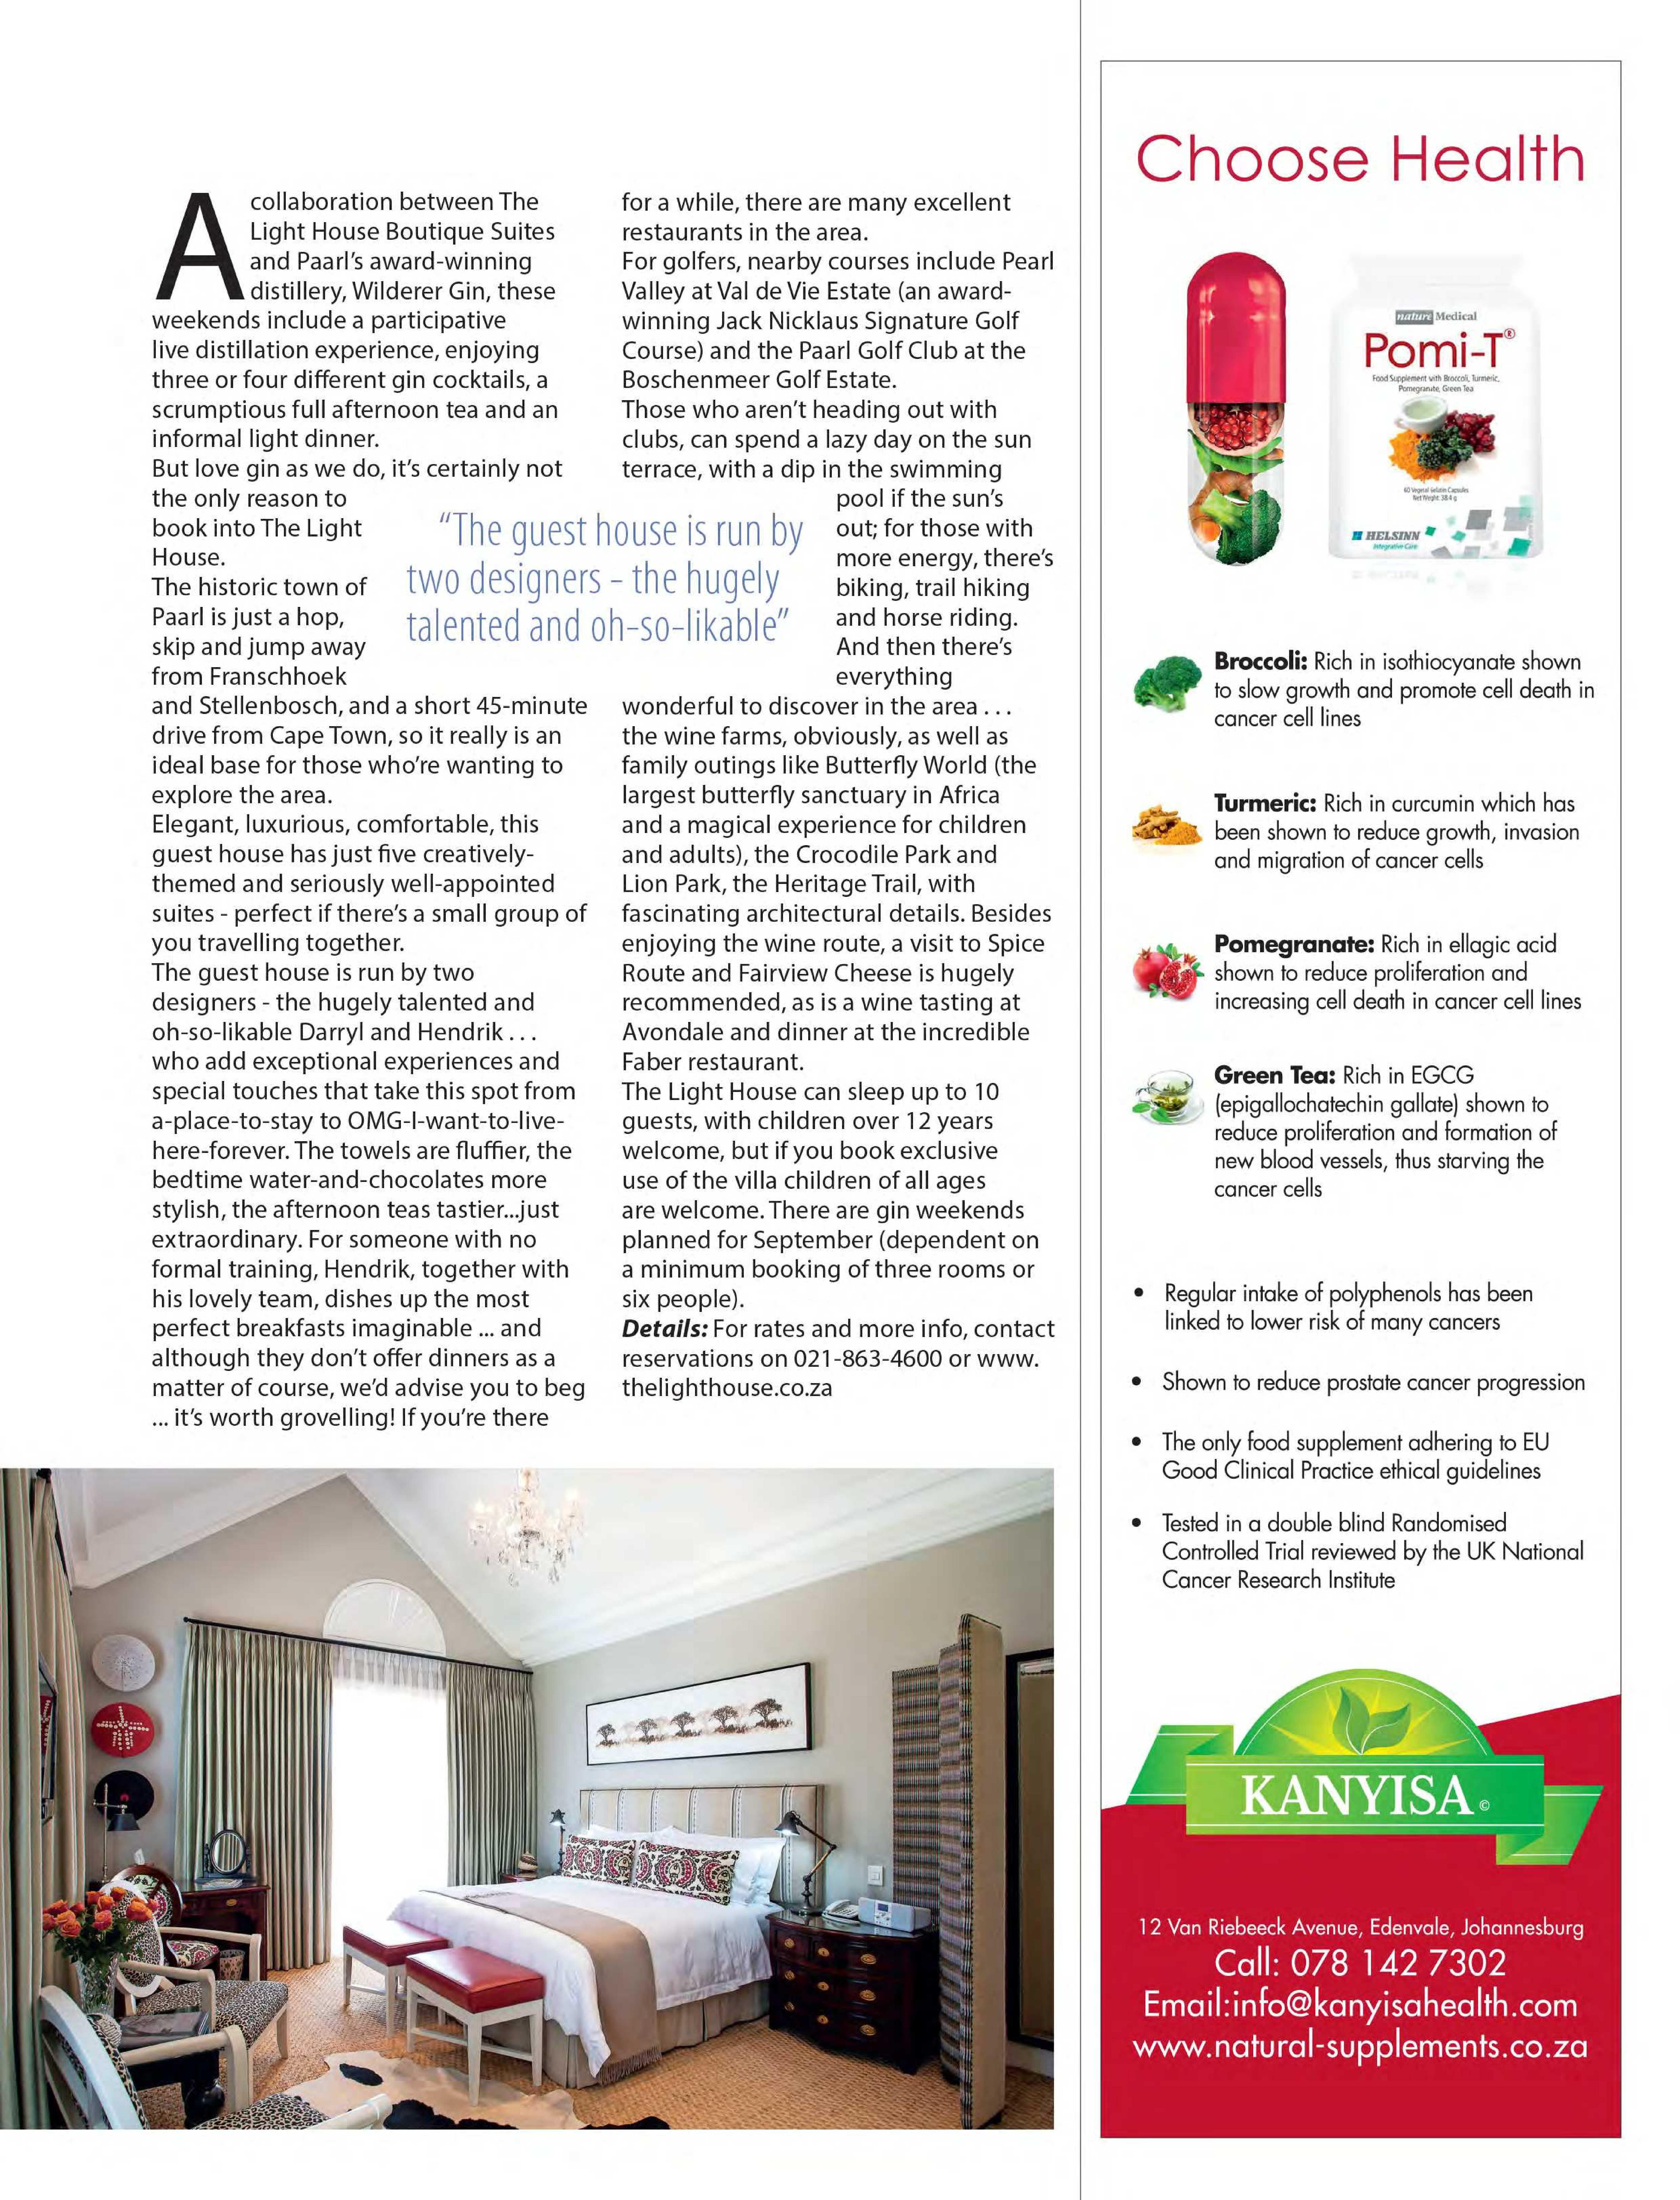 get-magazine-ballitoumhlanga-september-2018-epapers-page-65